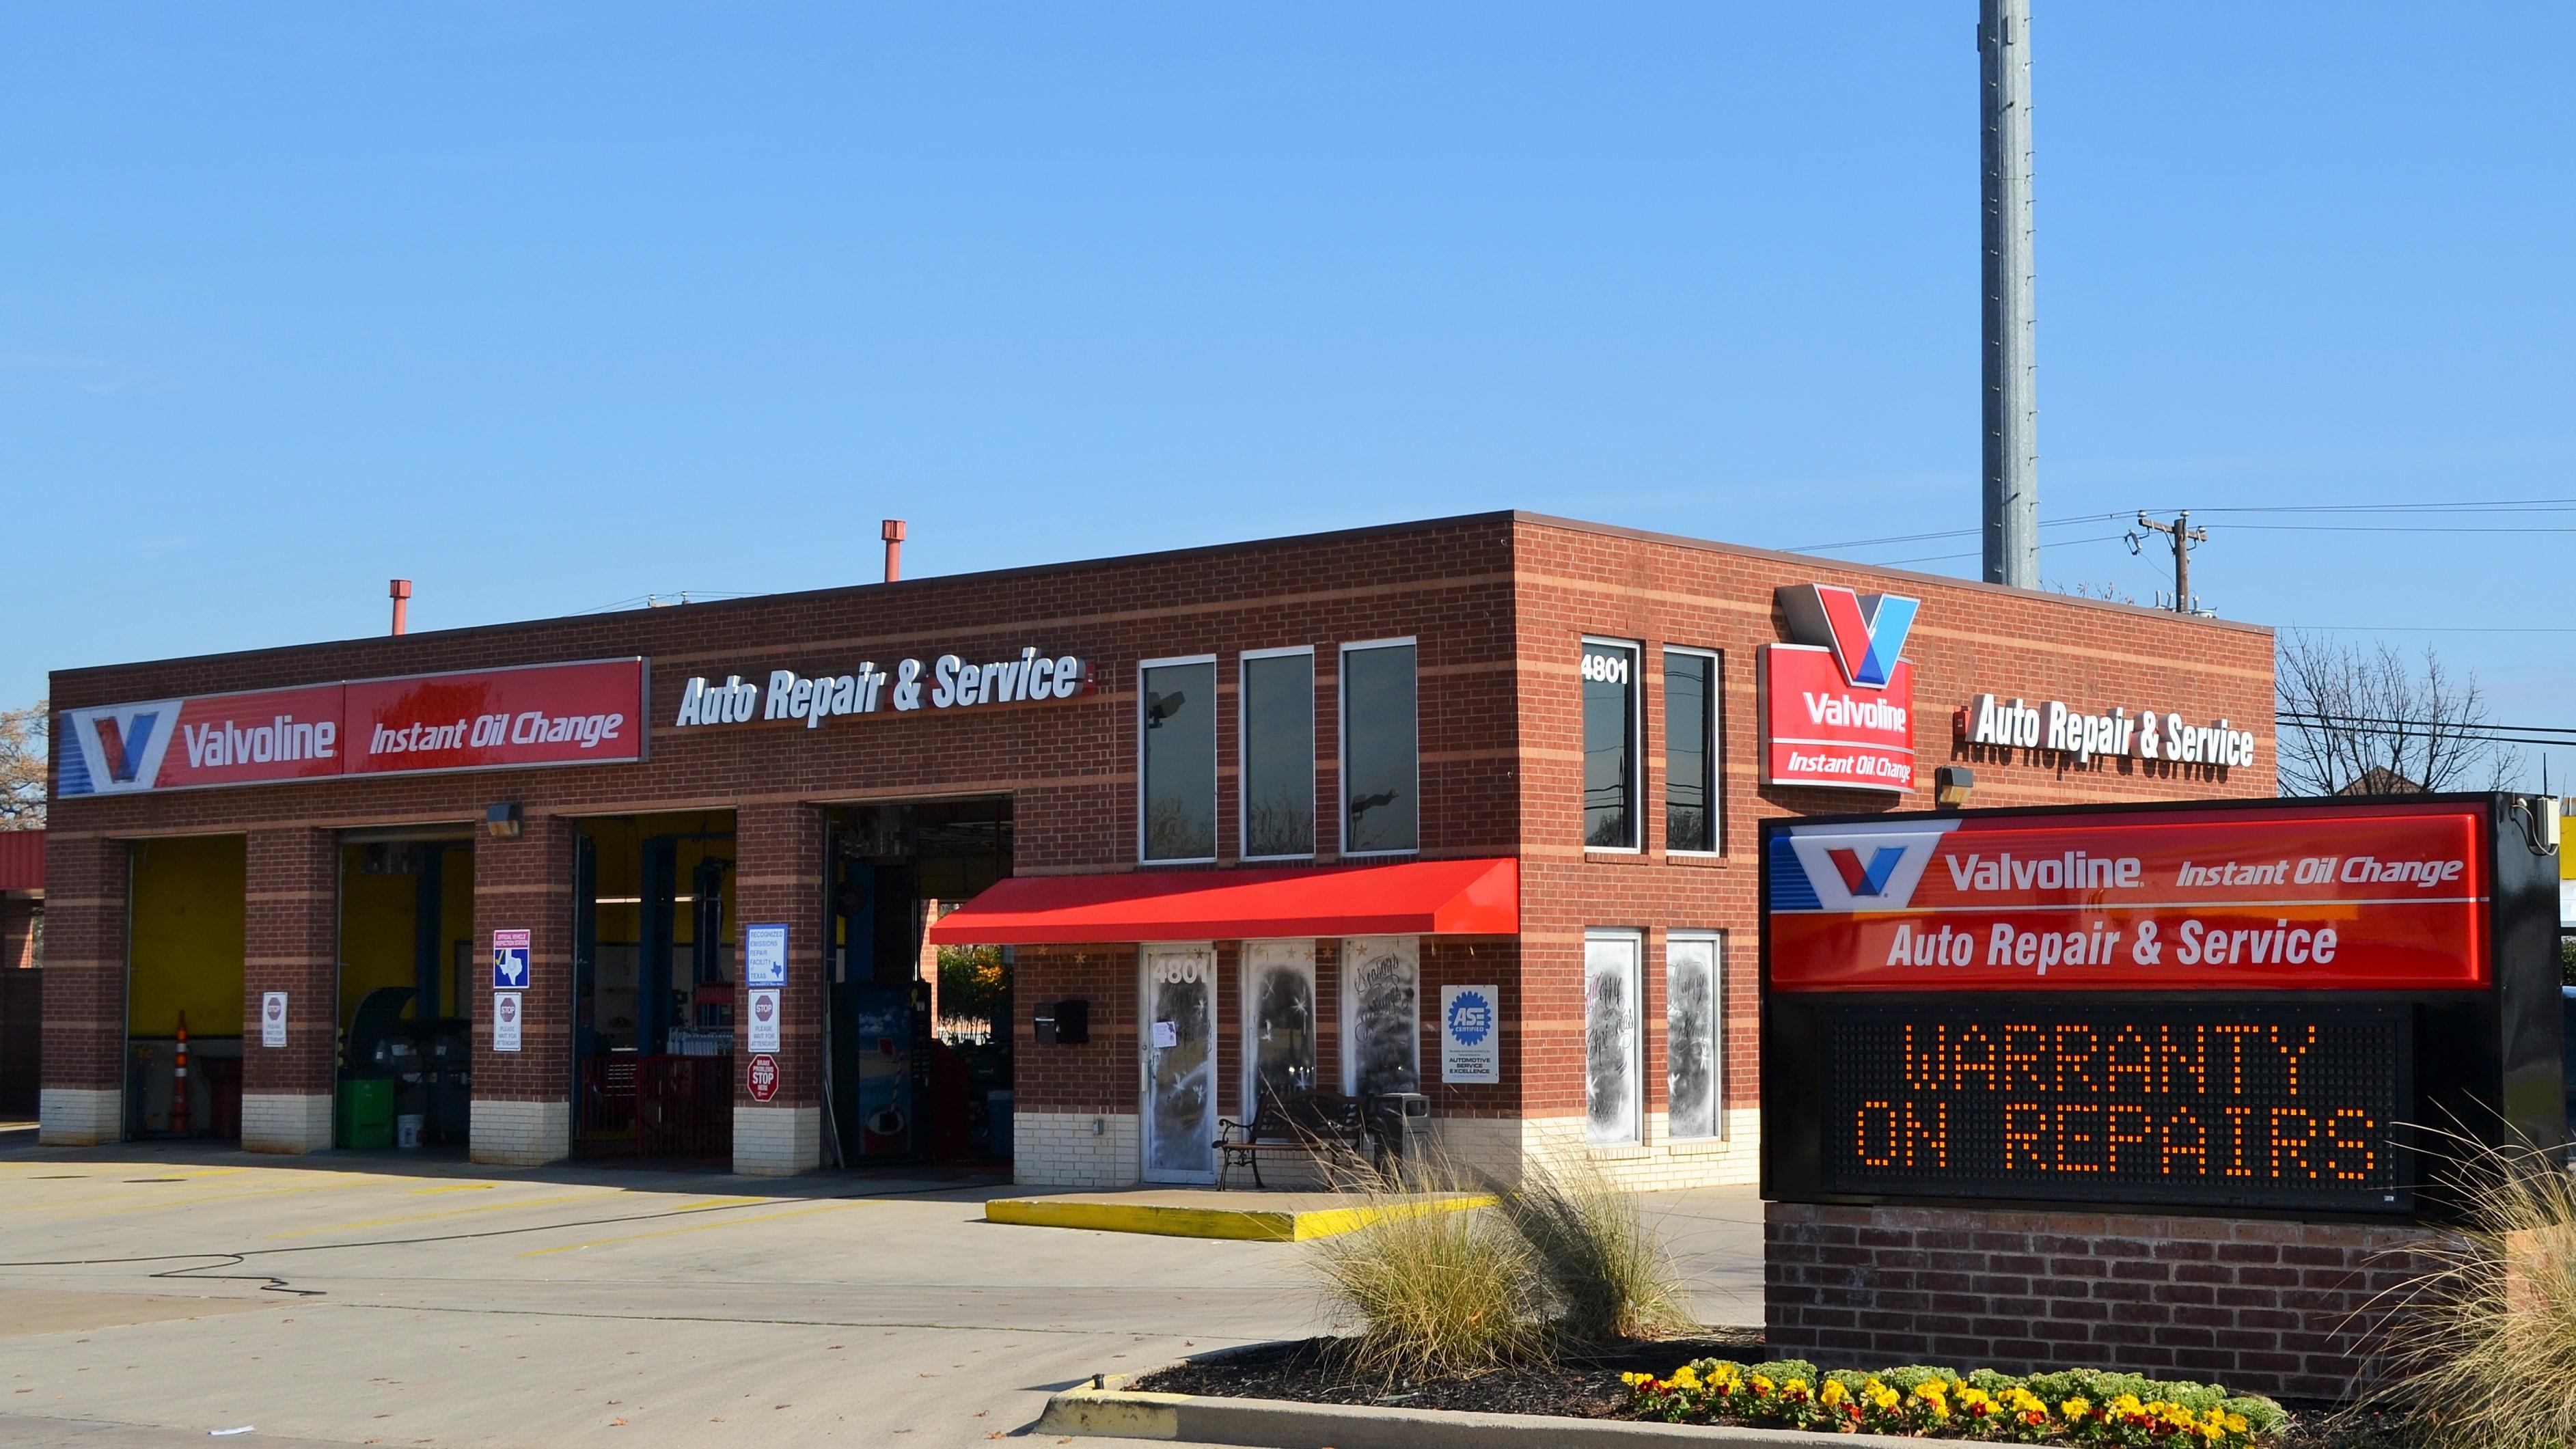 Valvoline Instant Oil Change Arlington, TX, 4801 West Sublett Rd